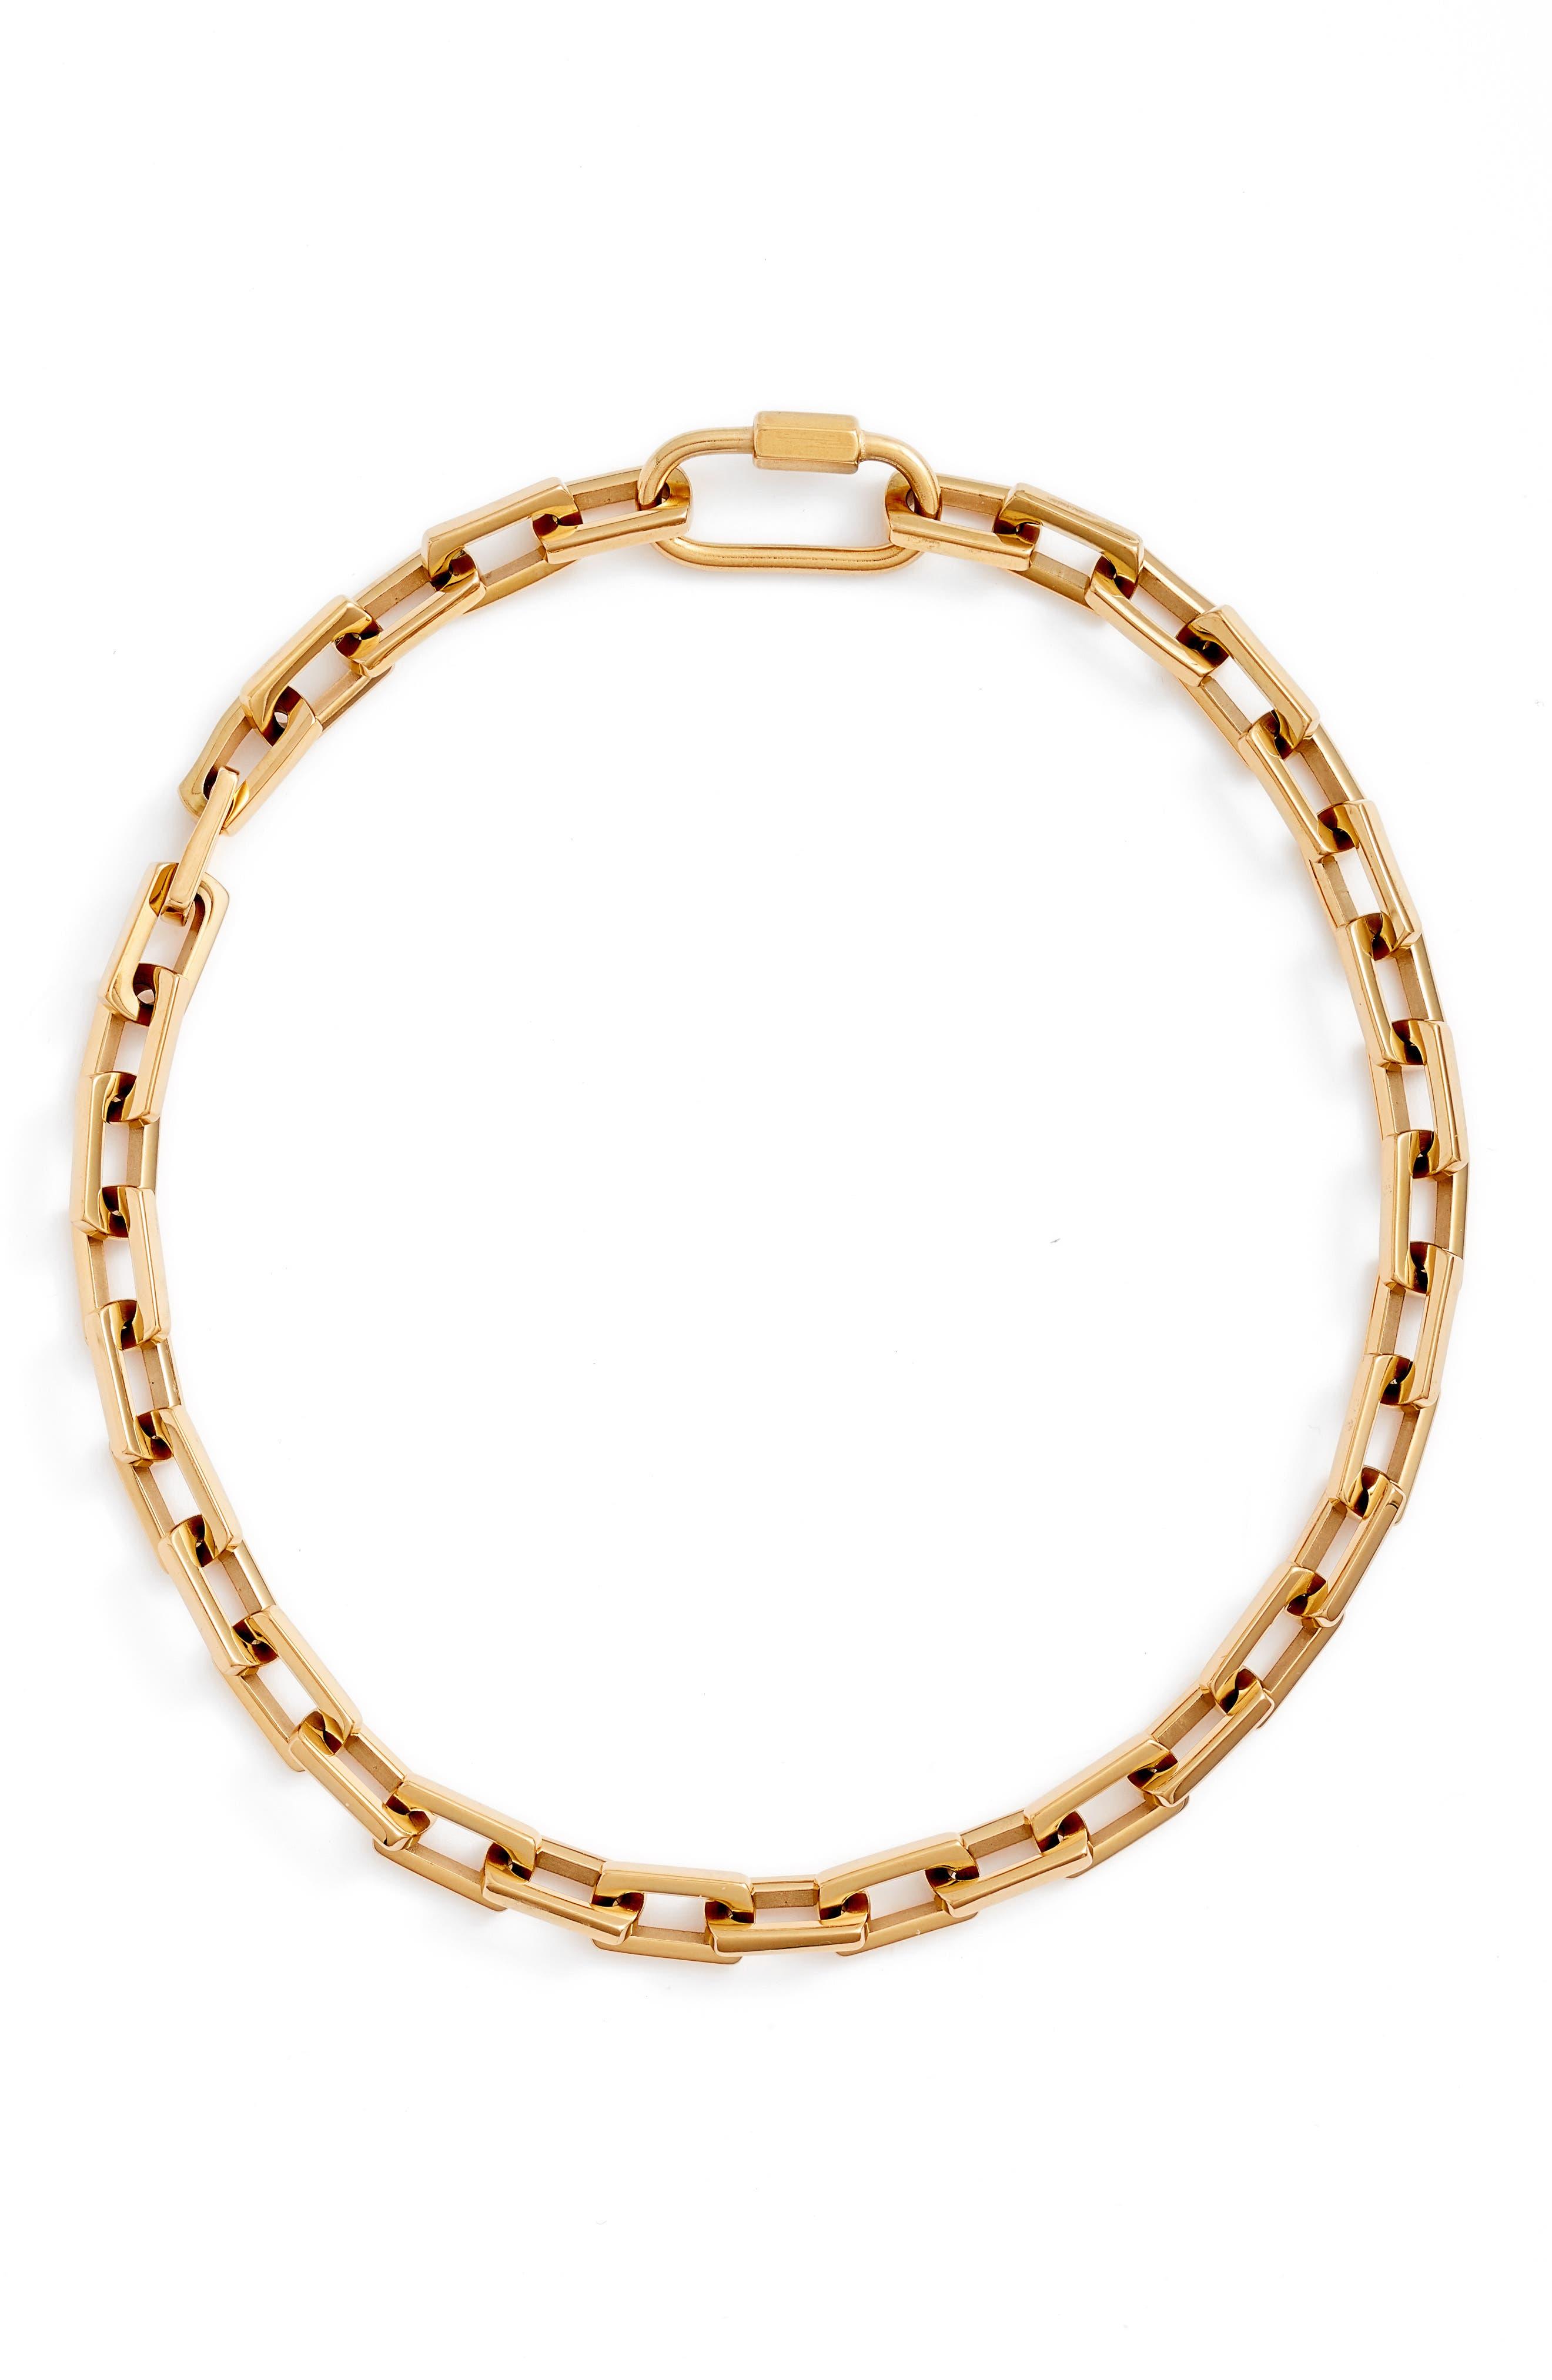 Maxi Gage Necklace